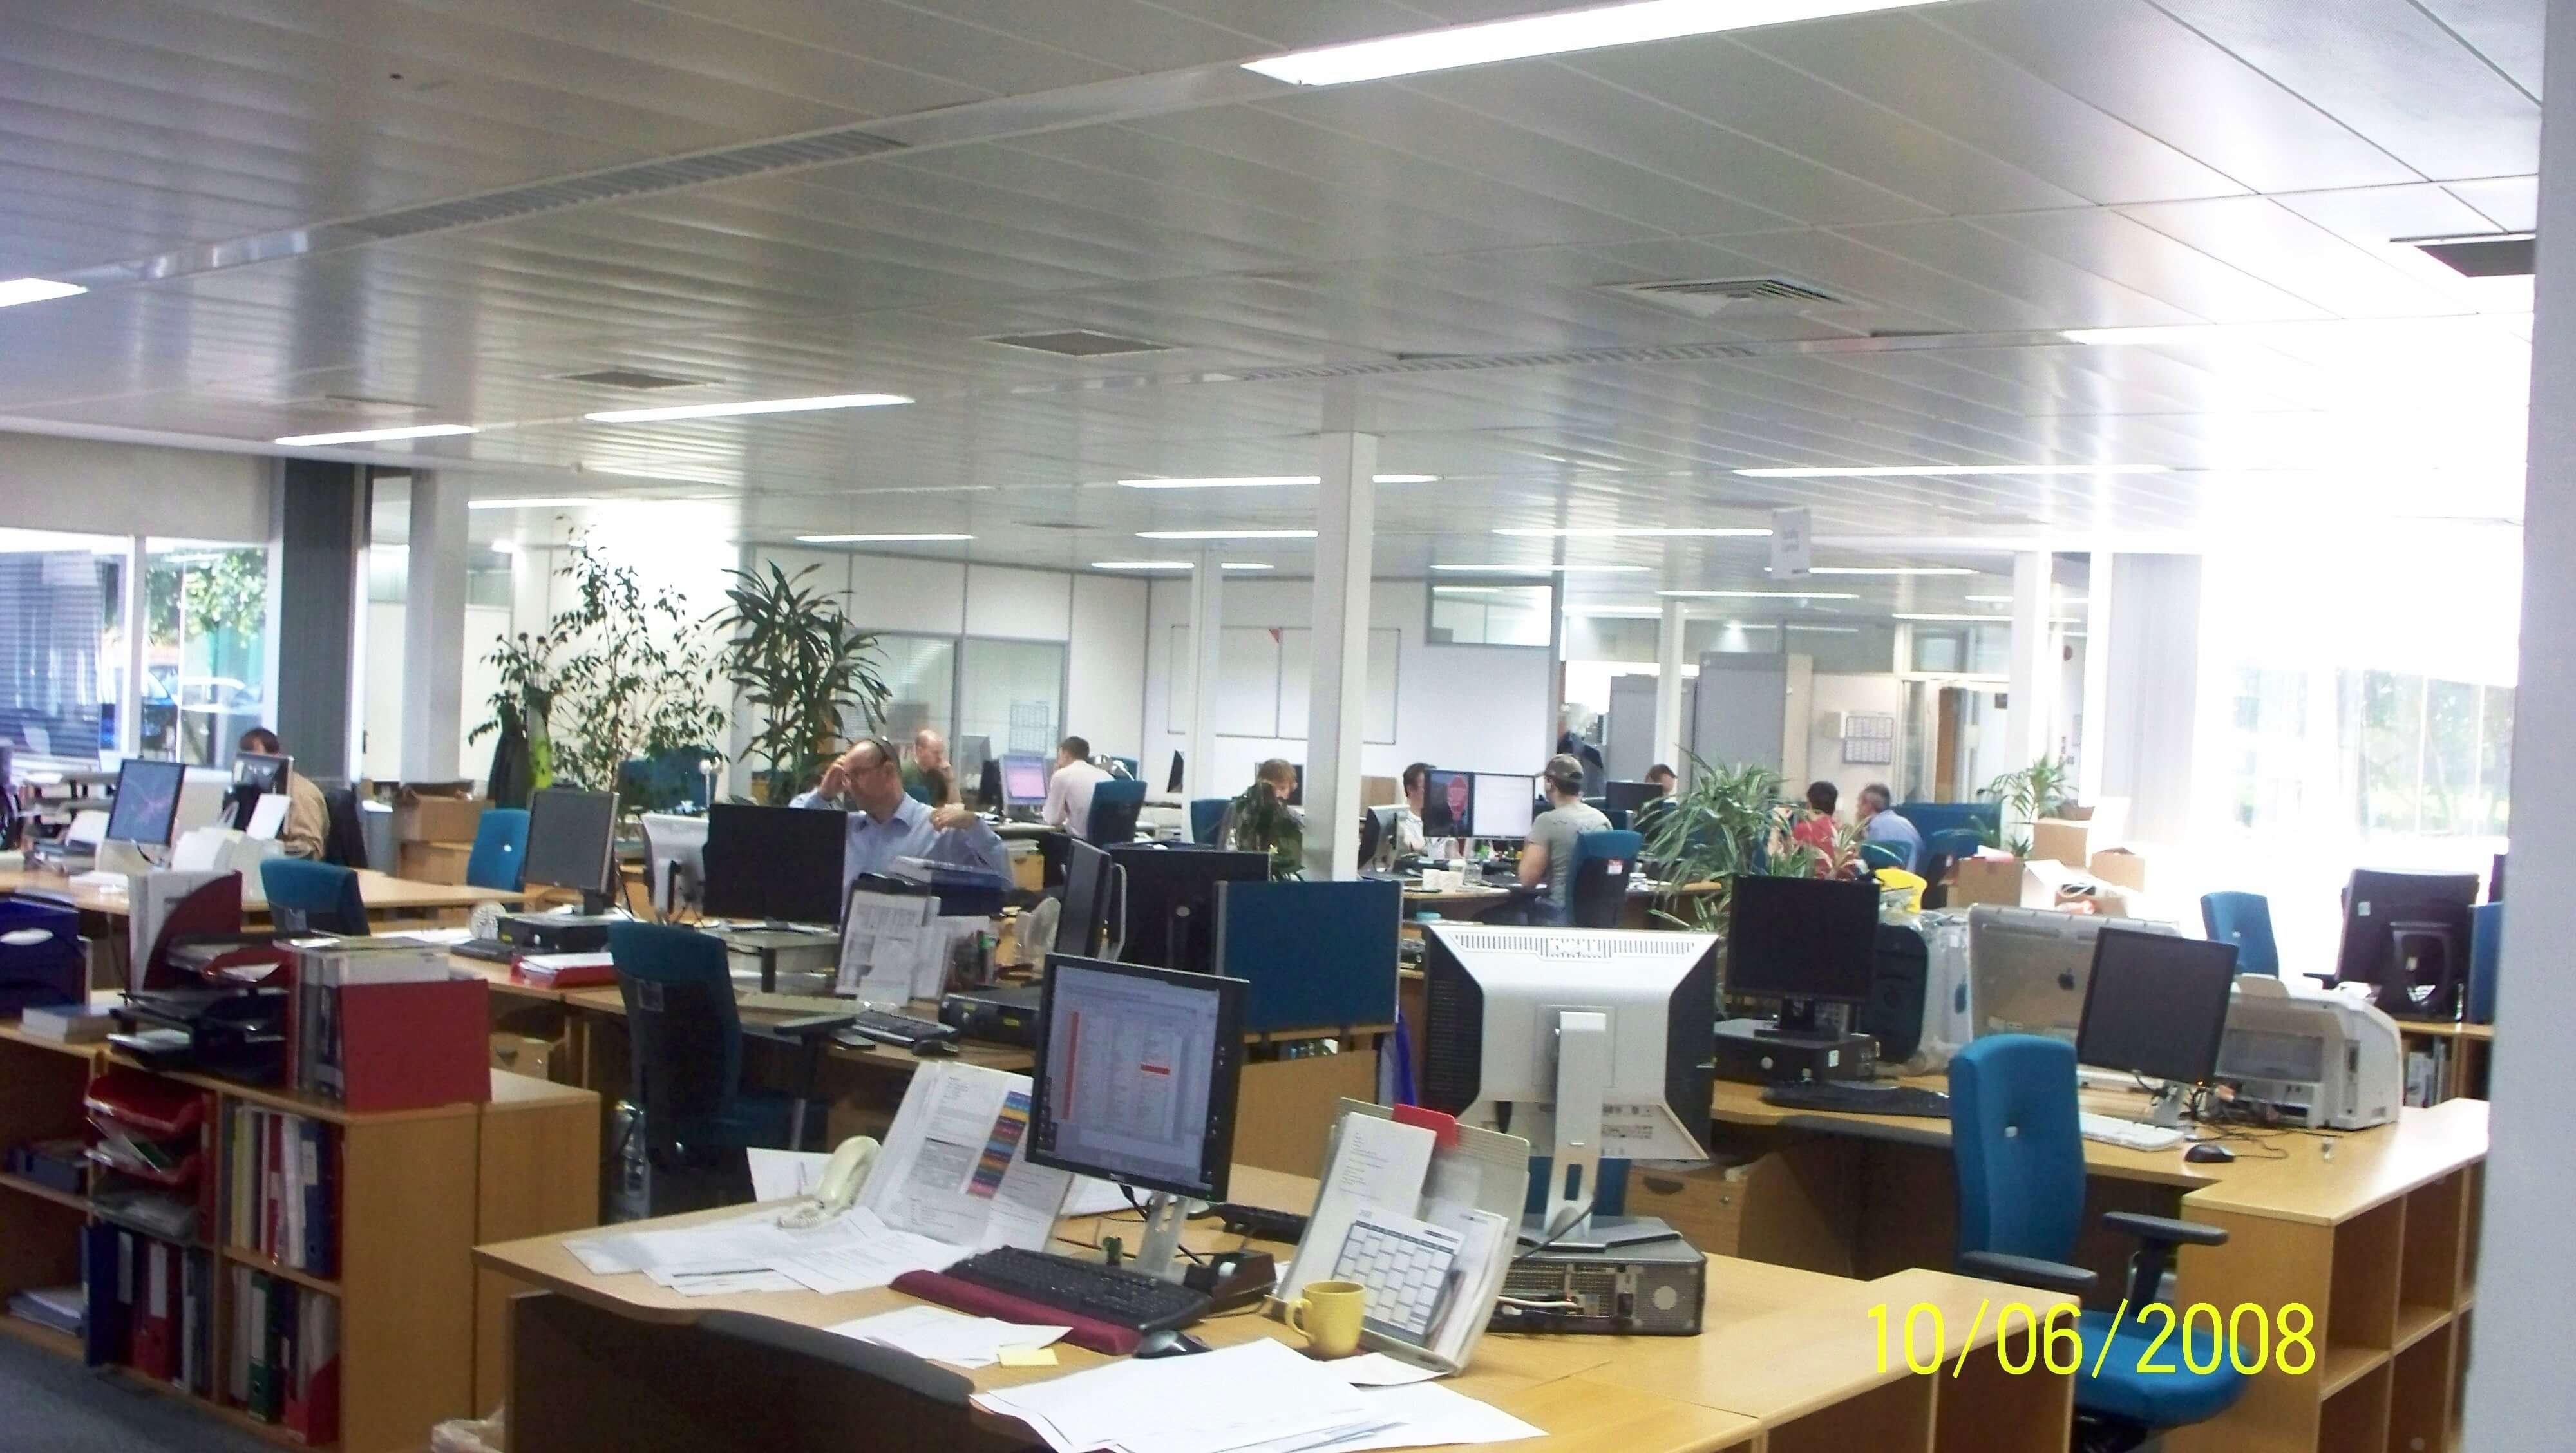 Office Refurbishment in Swindon